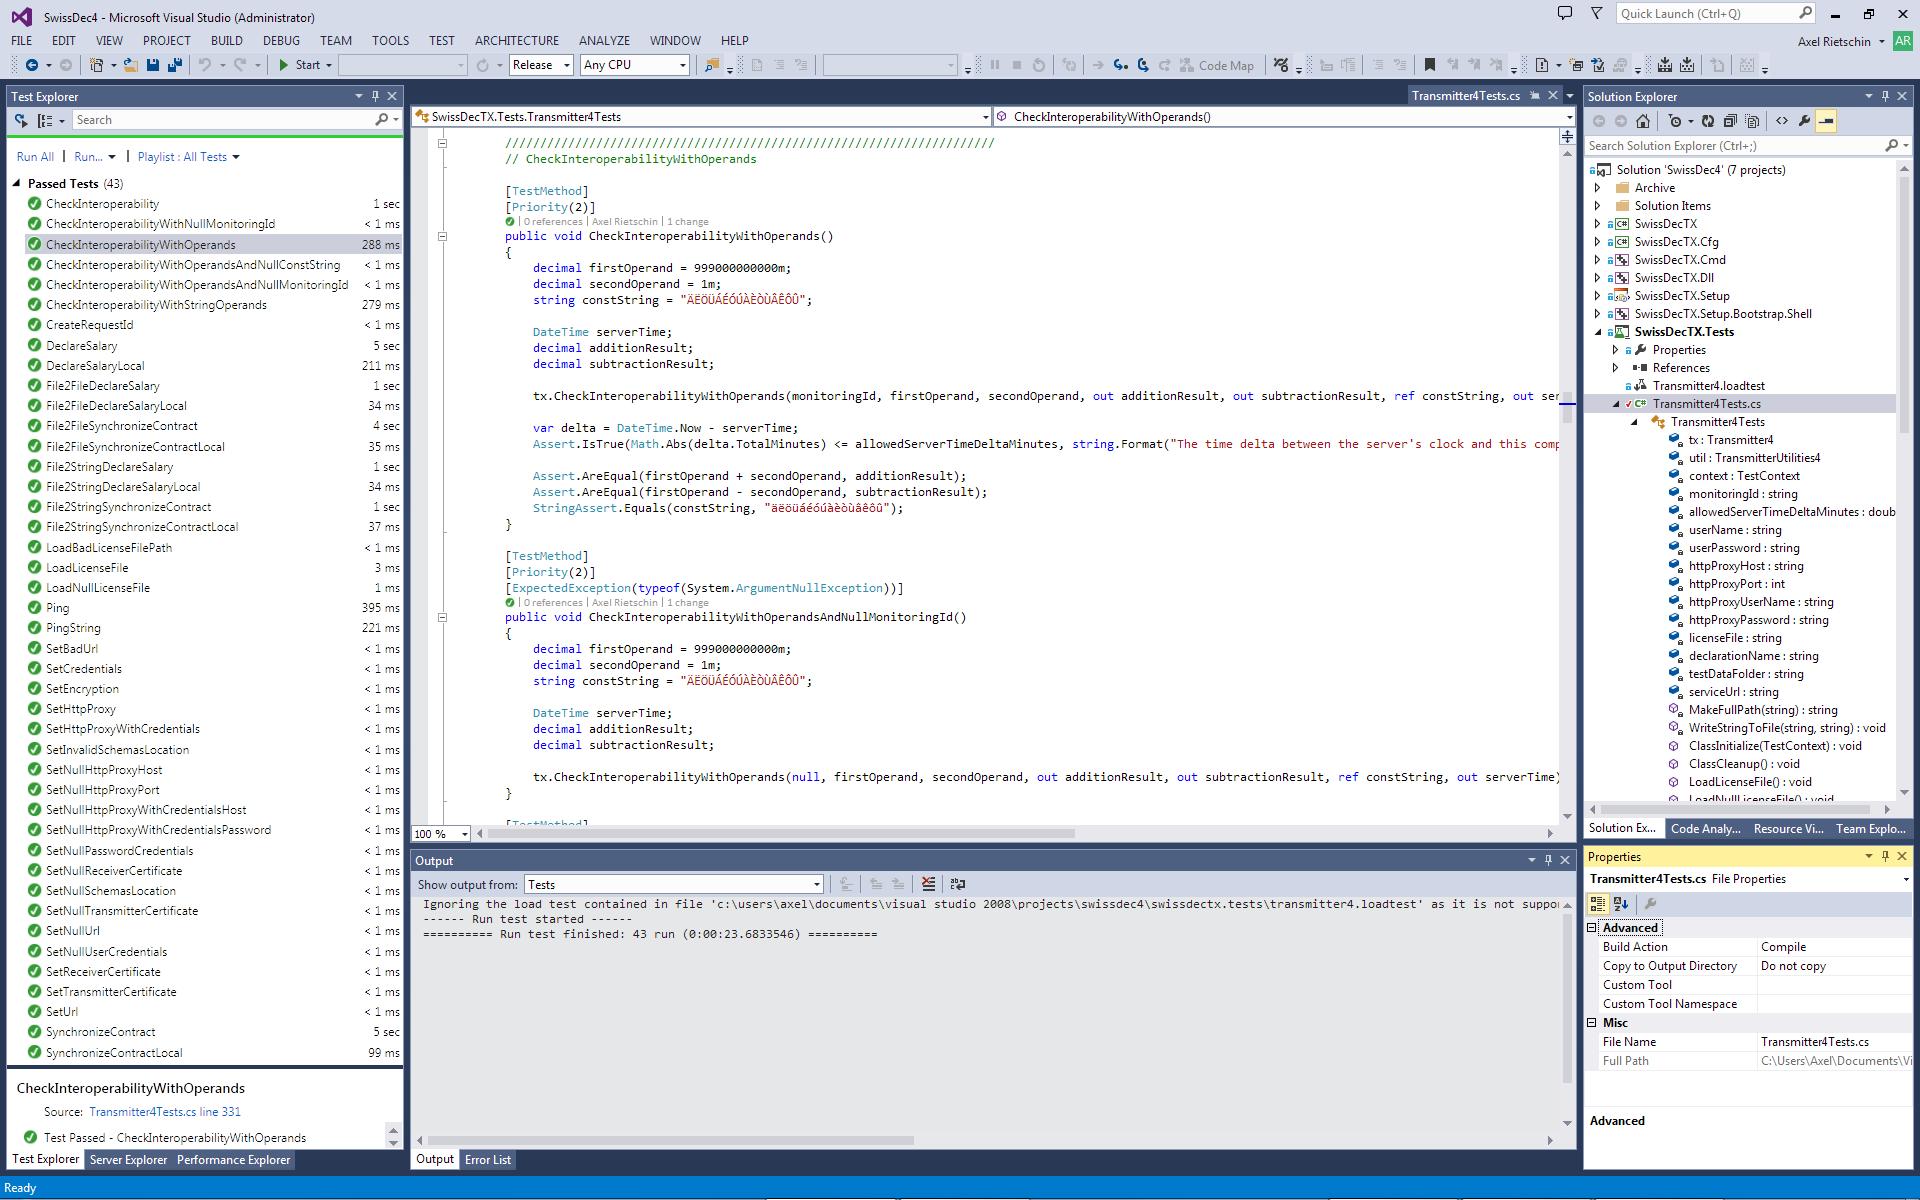 Testing SwissDecTX 4.0x